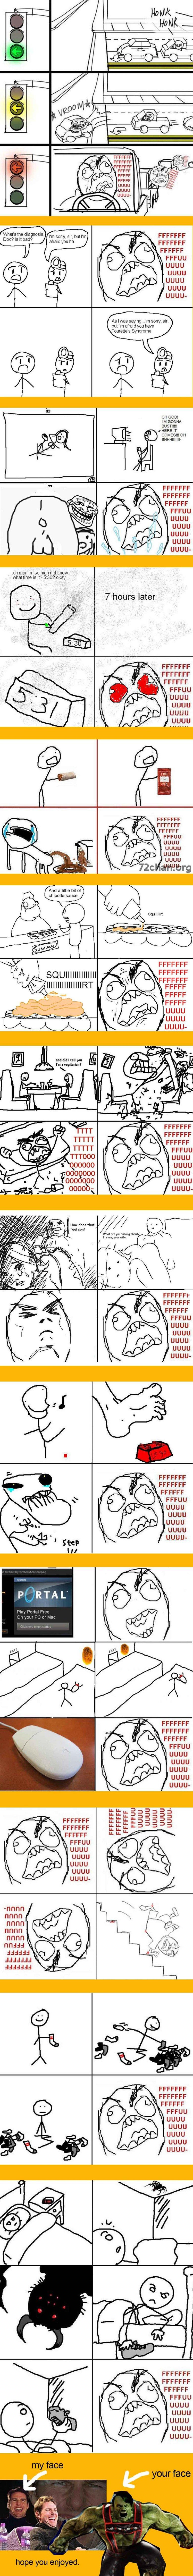 Rage Comics Comp. put together some top tier rage comic.. the mac one got me. rage comics fuuuuu